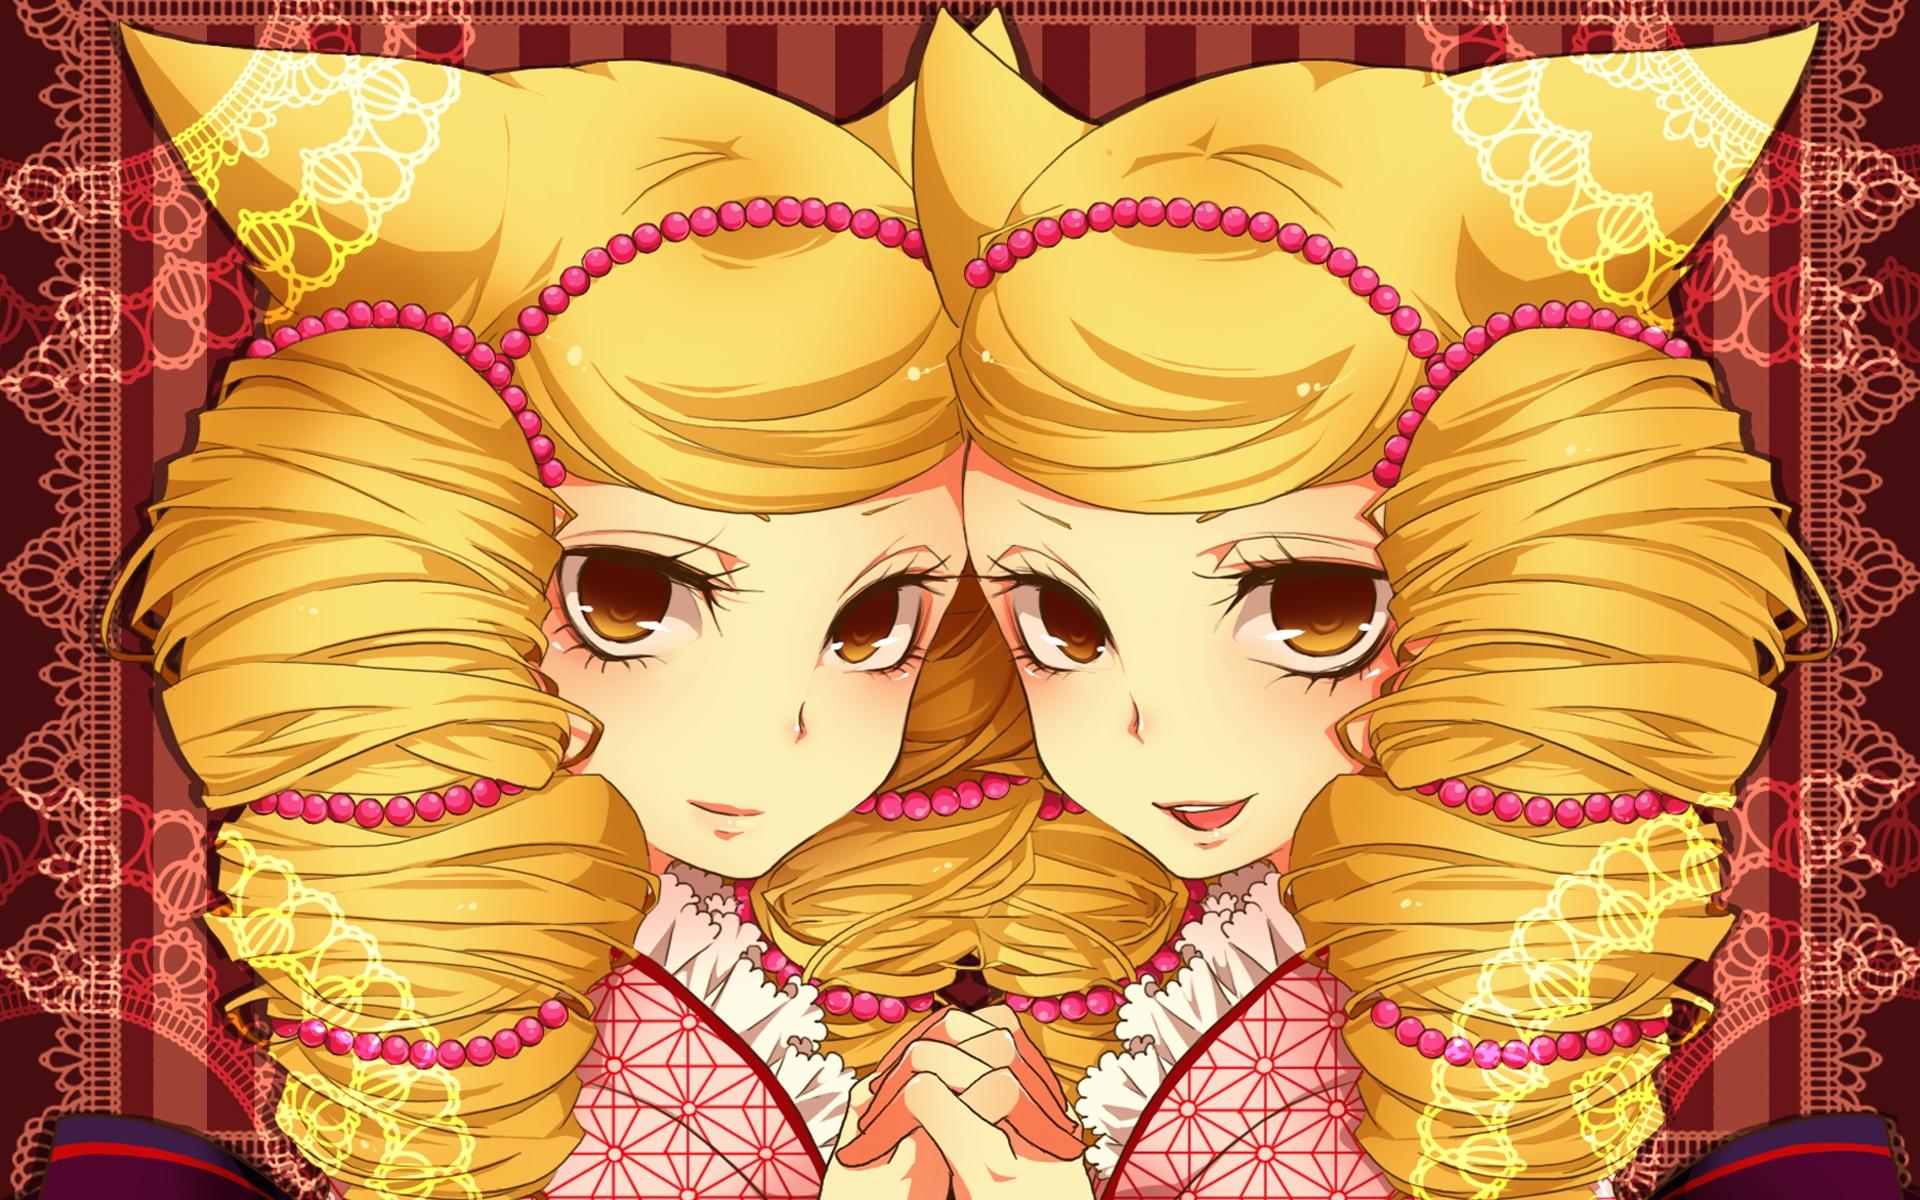 аниме картинки близняшек: